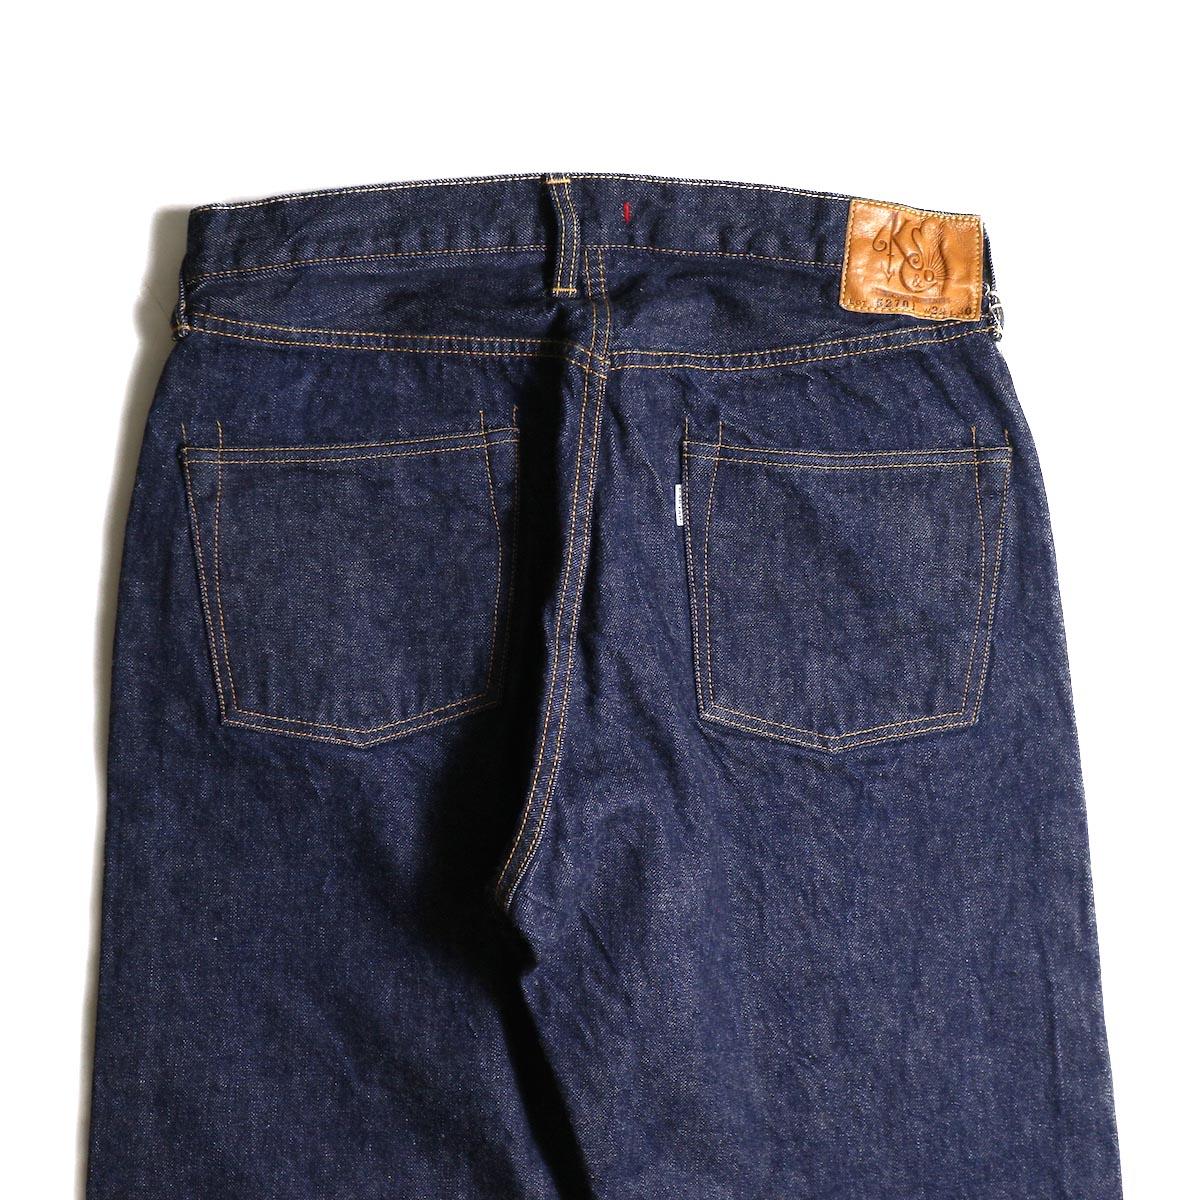 Kaptain Sunshine / Baggy Cut Straight Denim Pants -One Wash バックポケット